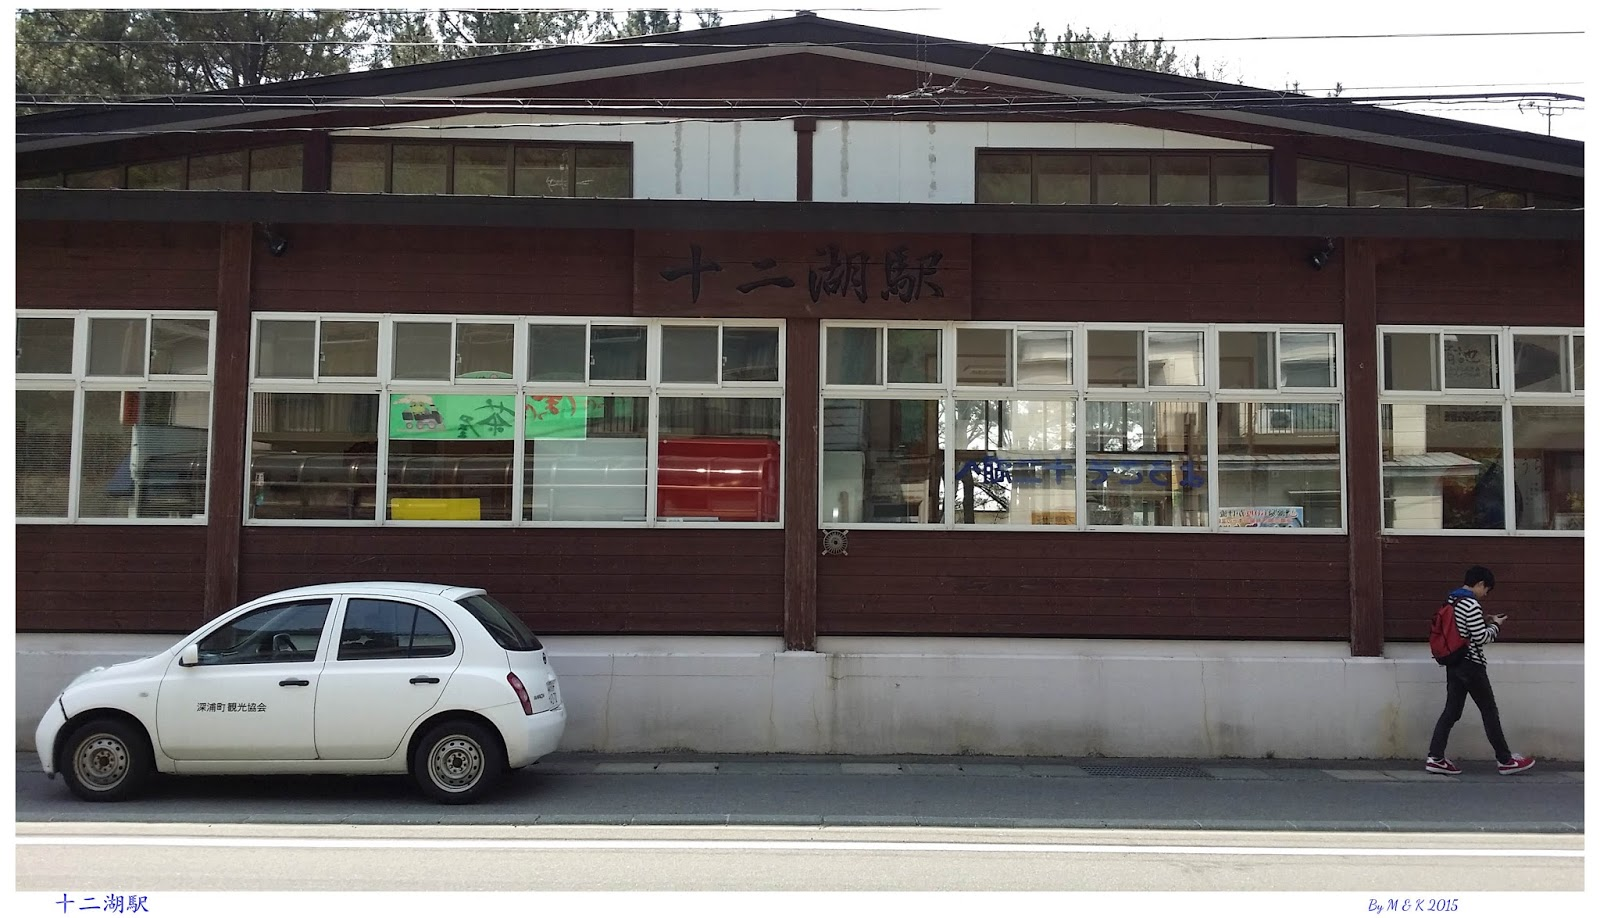 M & K 的遊記: 2015 東北關東走馬看花之旅 - Day 4.2 能代駅、十二湖駅